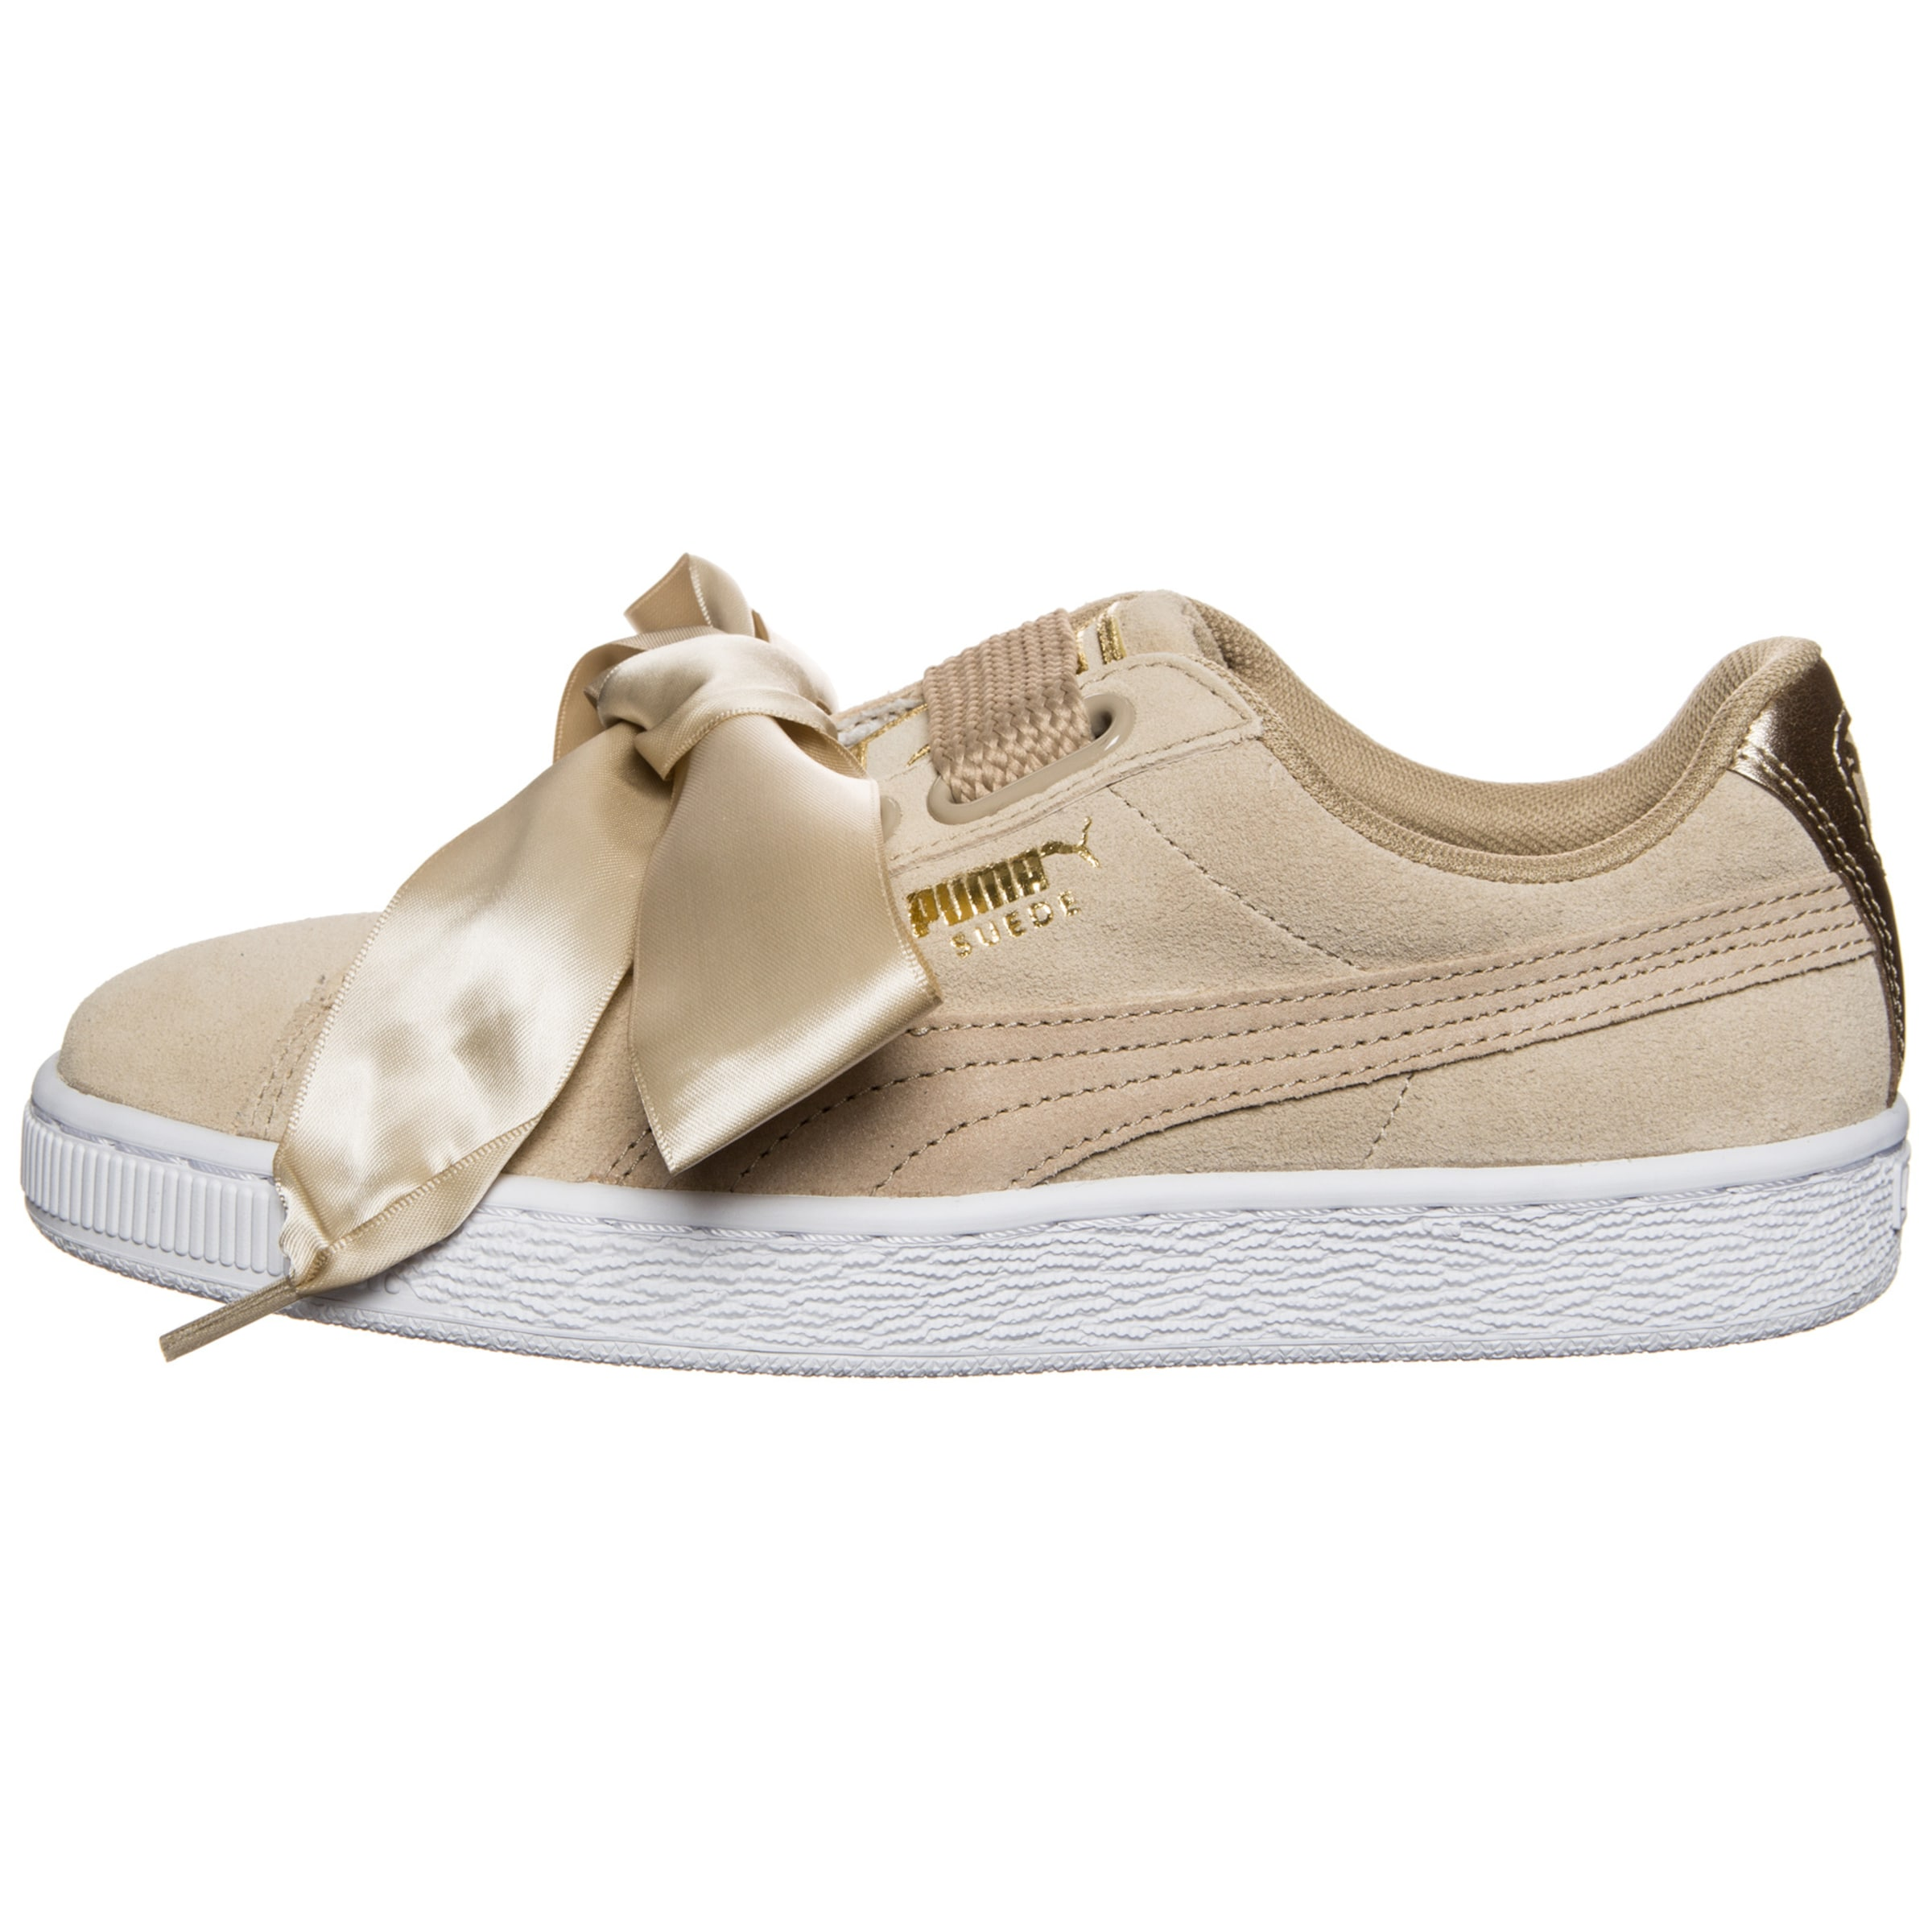 Puma Safari' In Sneaker Heart HellbraunWeiß 'suede yvn0wmN8O